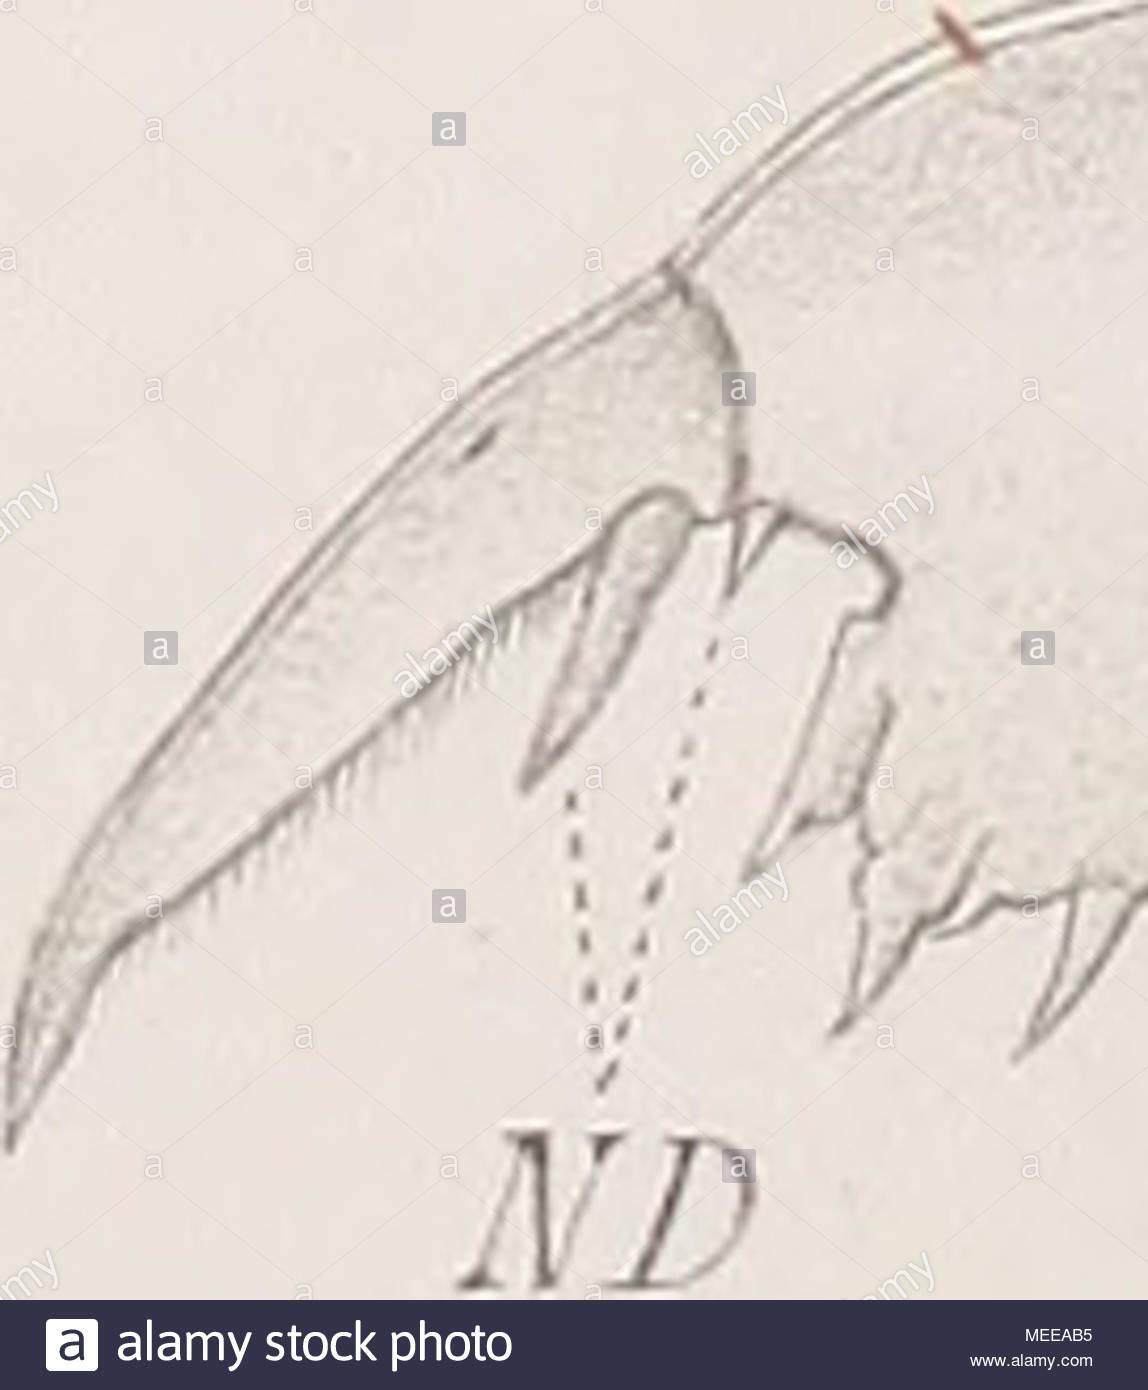 cladoceren der umgebung von basel ytr lin kl thstinqelin MEEAB5